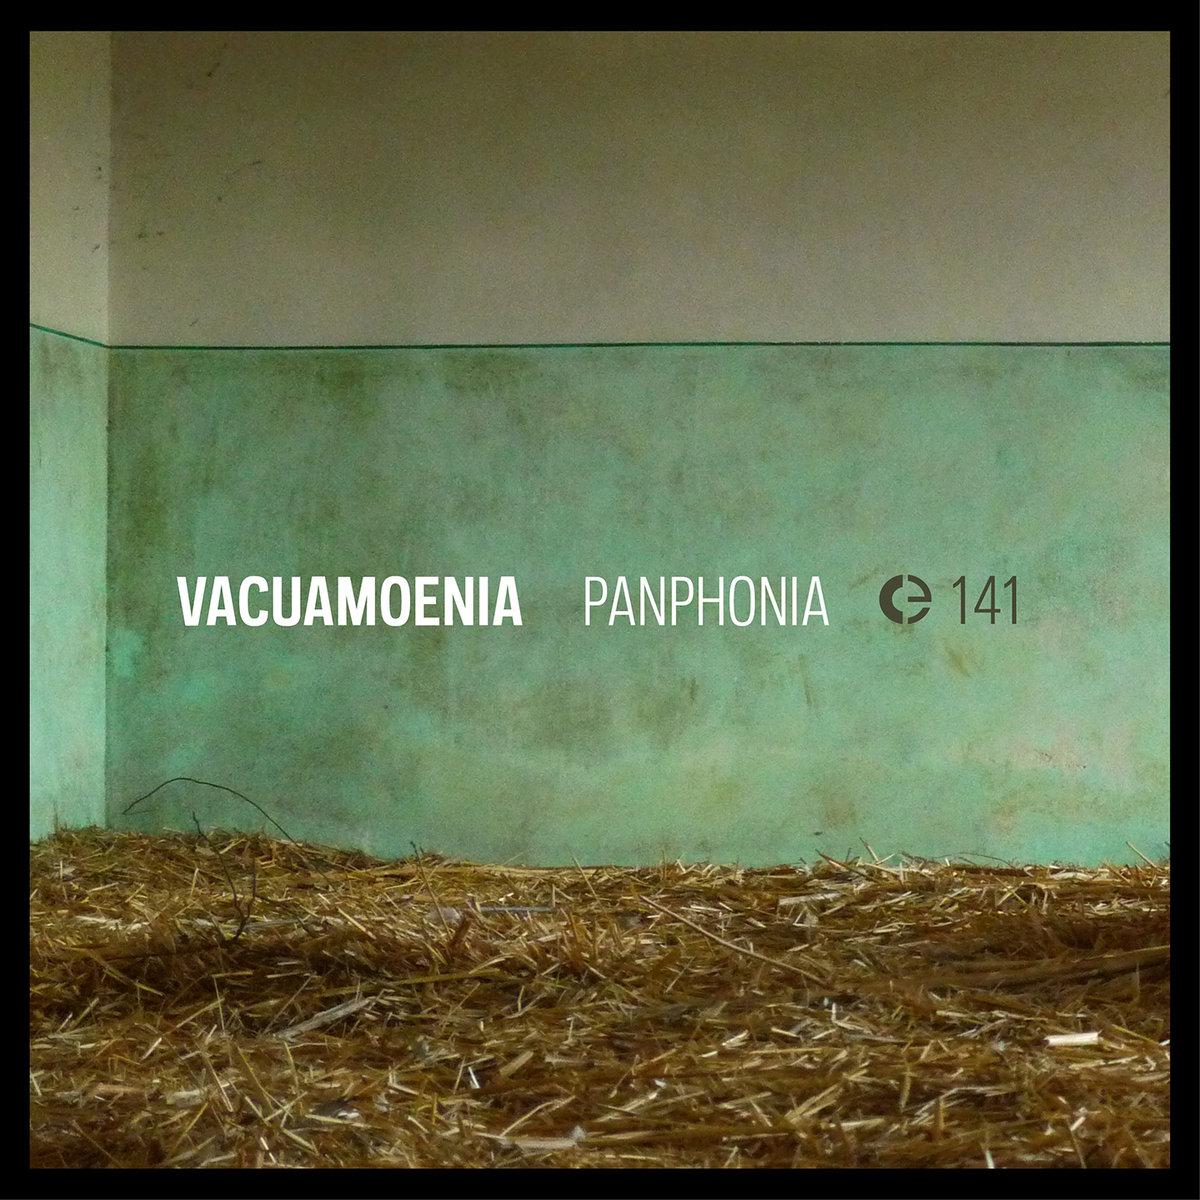 Vacuamoenia ~ Panphonia